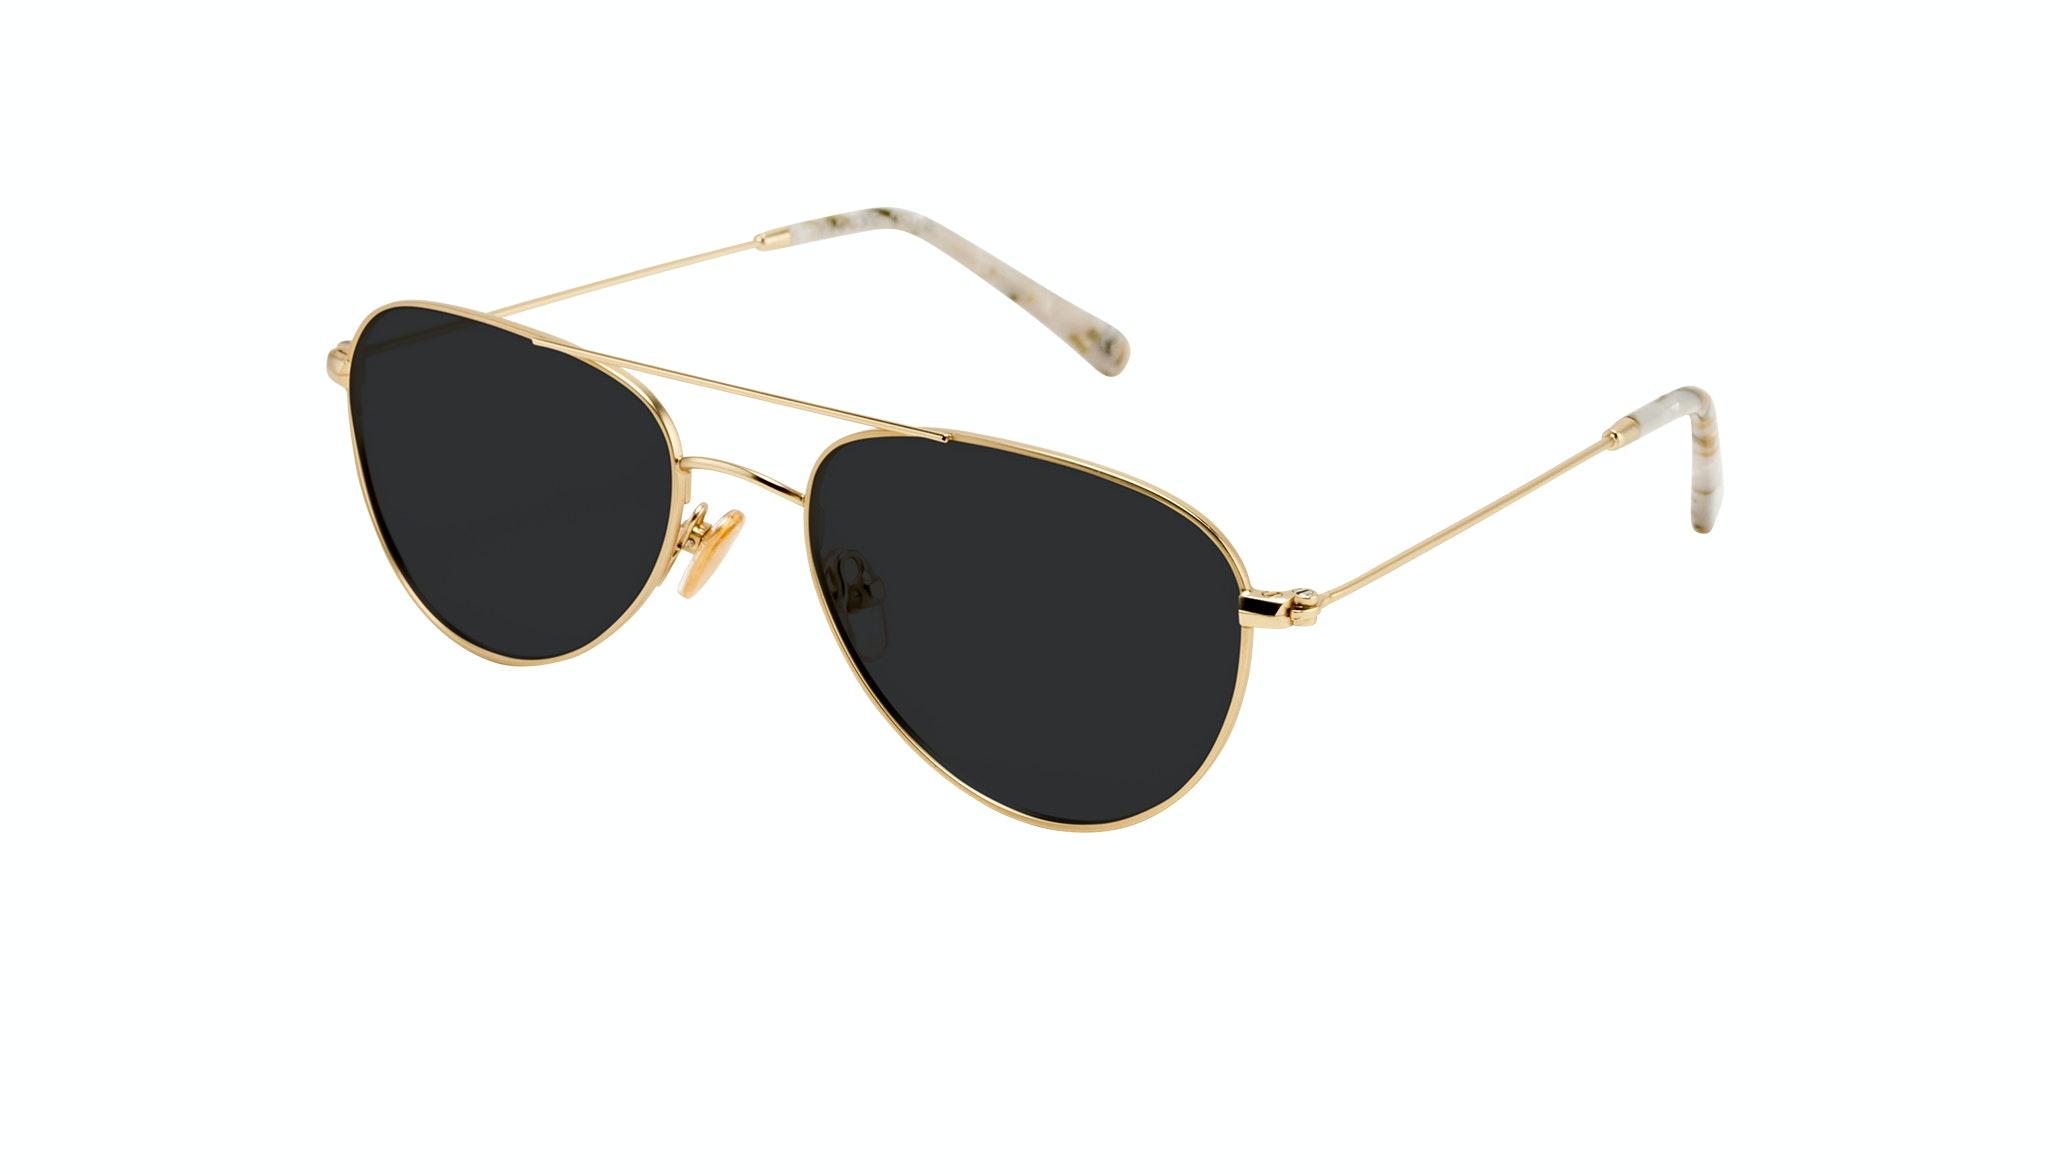 Affordable Fashion Glasses Aviator Sunglasses Women Figure Gold Tilt